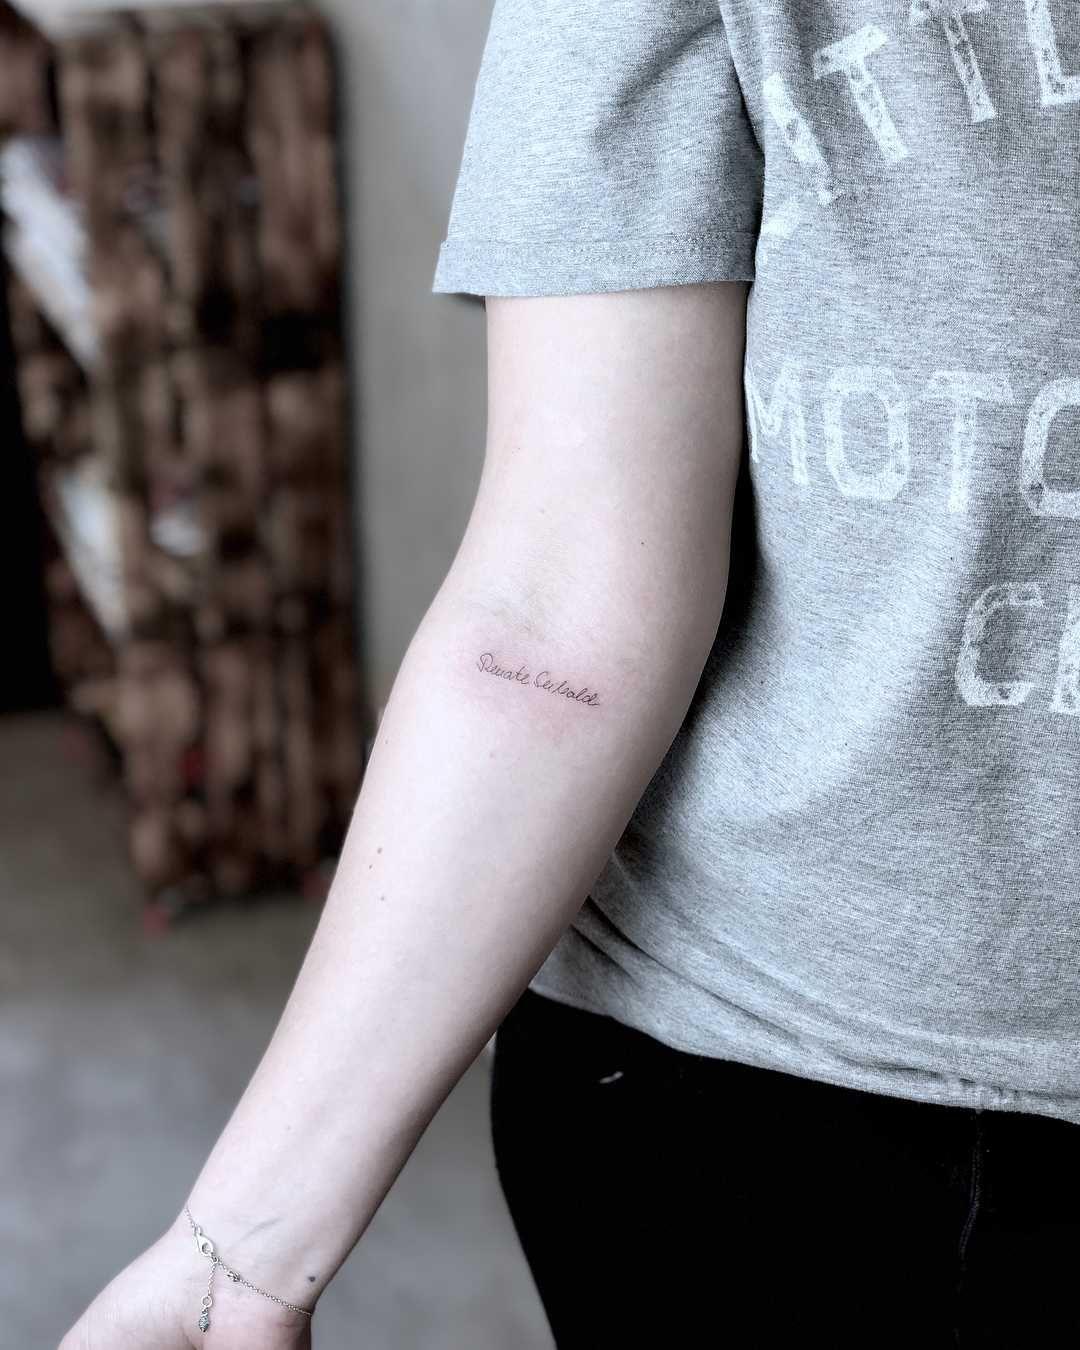 A Tiny Single Needle Signature Tattoo On The Right Forearm By Lox Luna Signature Tattoos Tattoos Word Tattoos